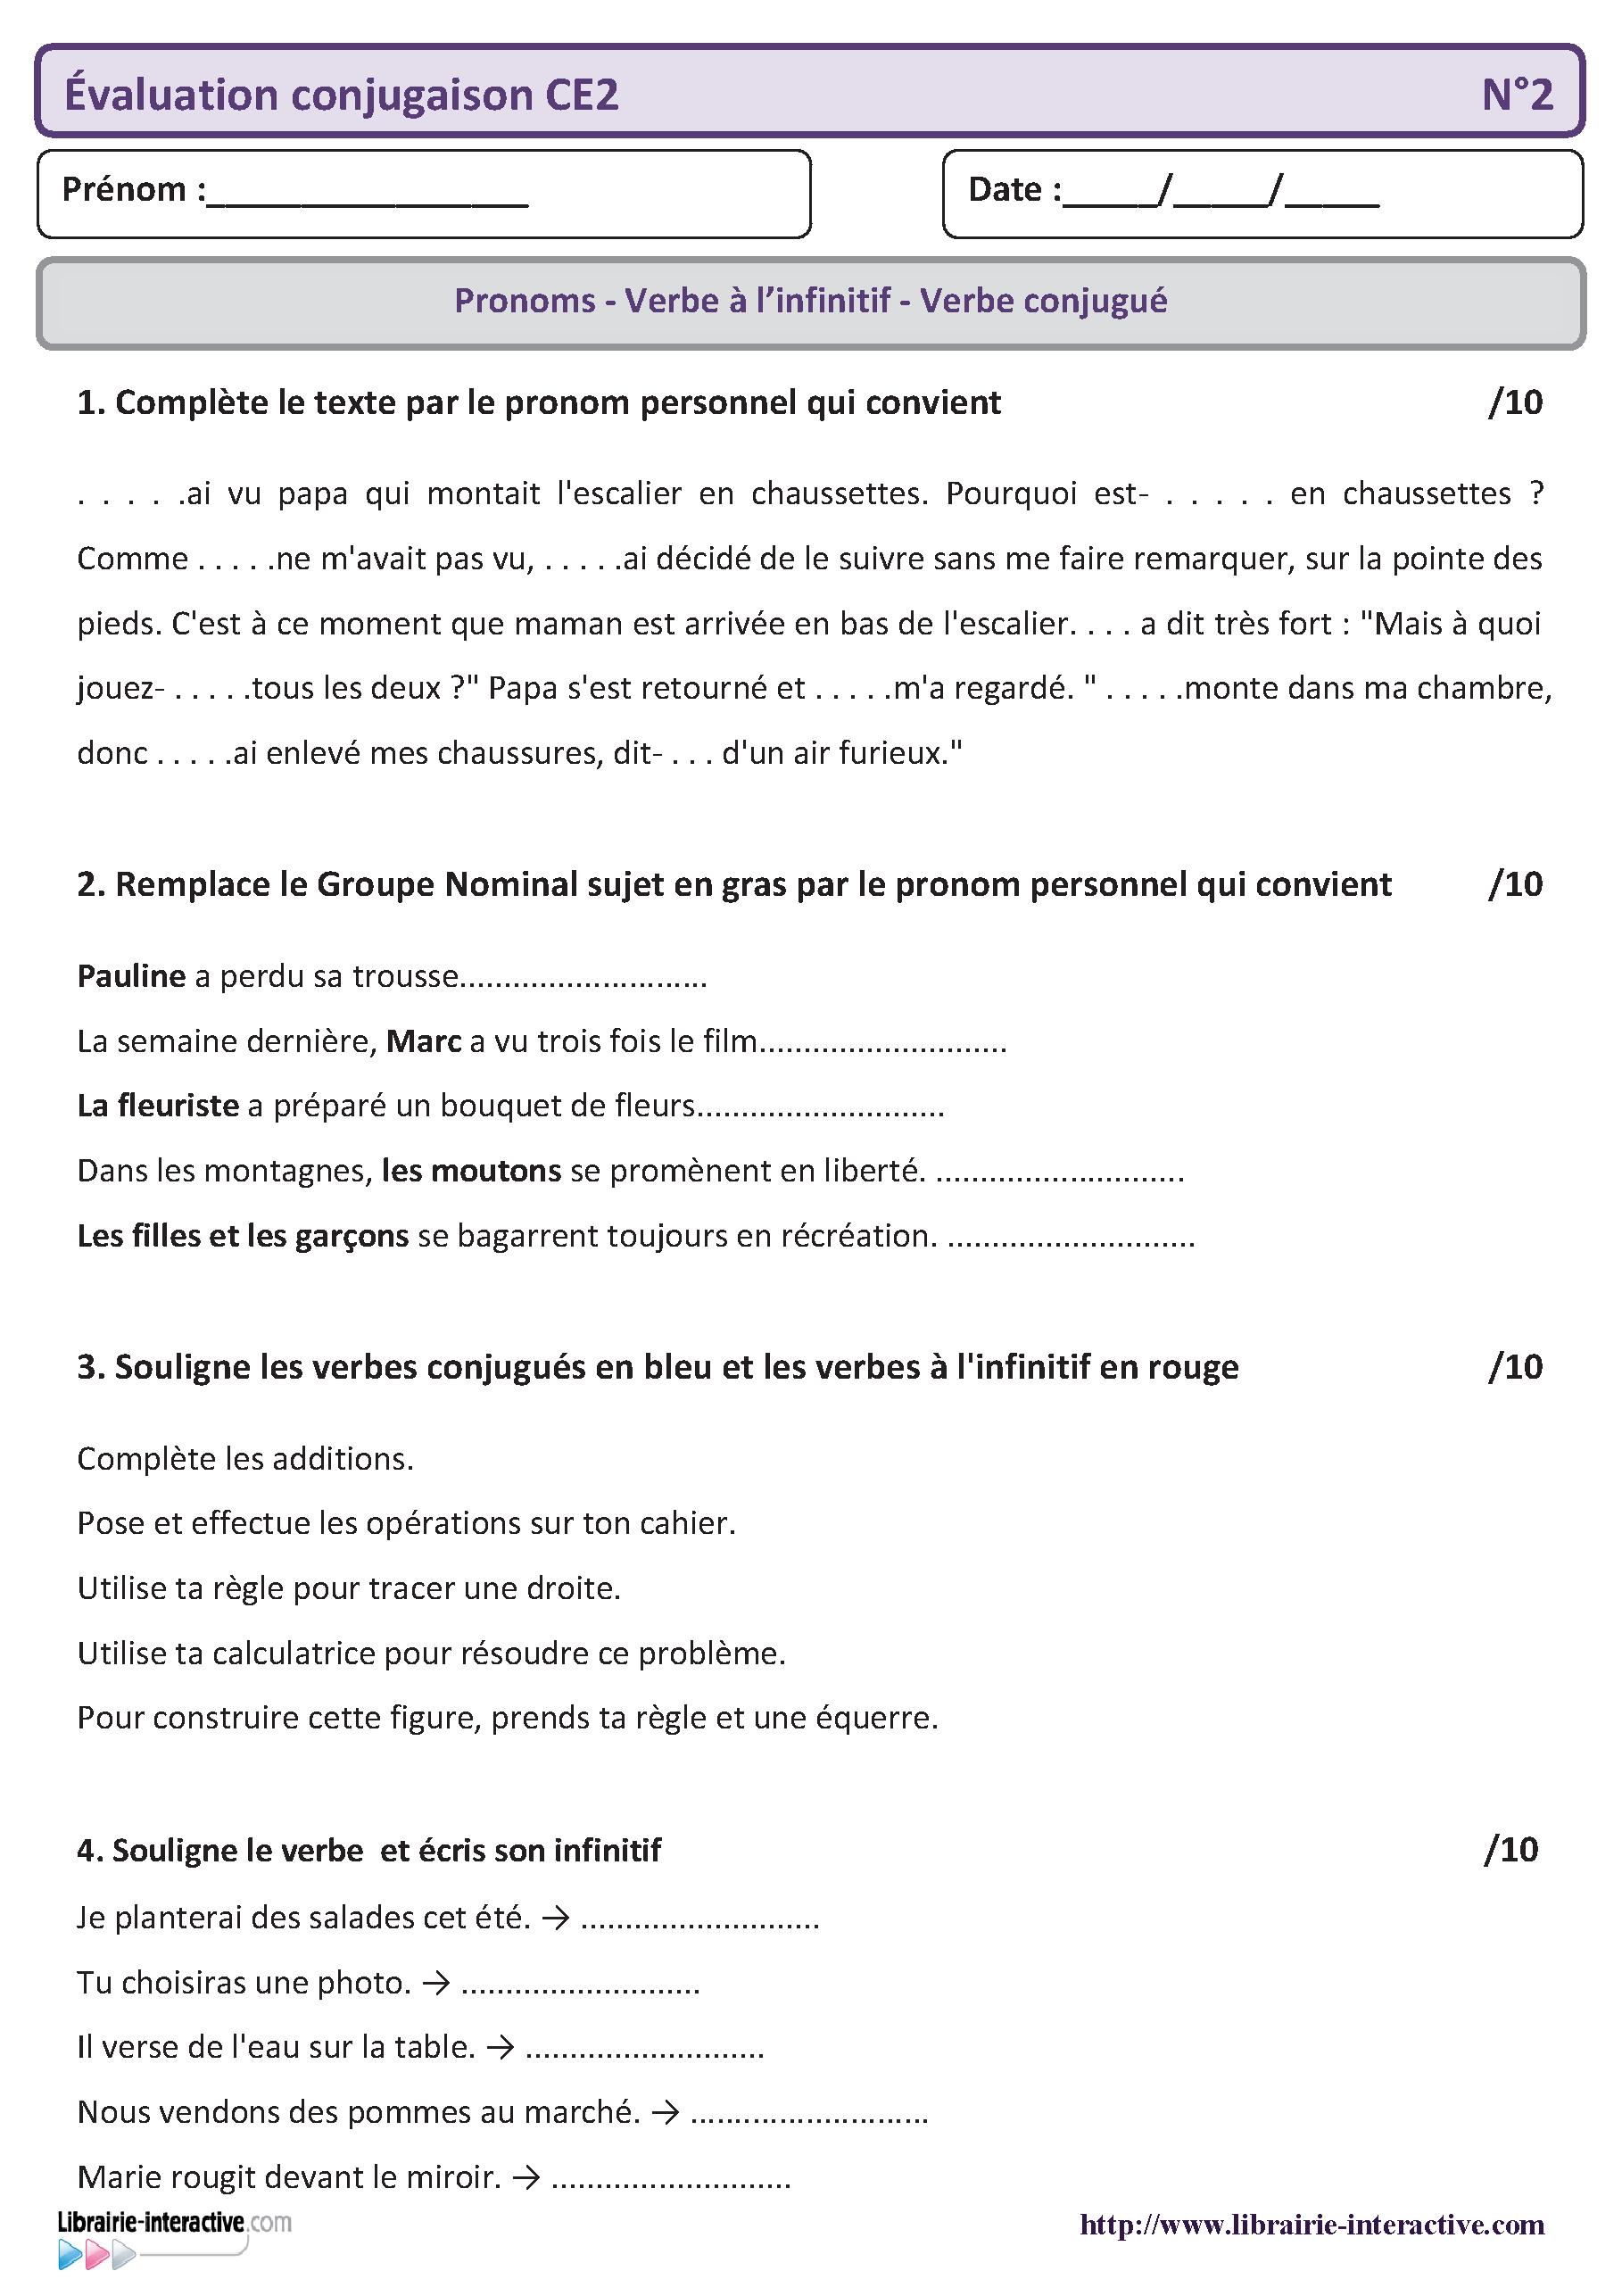 Librairie Interactive Evaluation Bilan Conjugaison Ce2 Conjugaison Ce2 Exercice Francais Ce2 Ce2